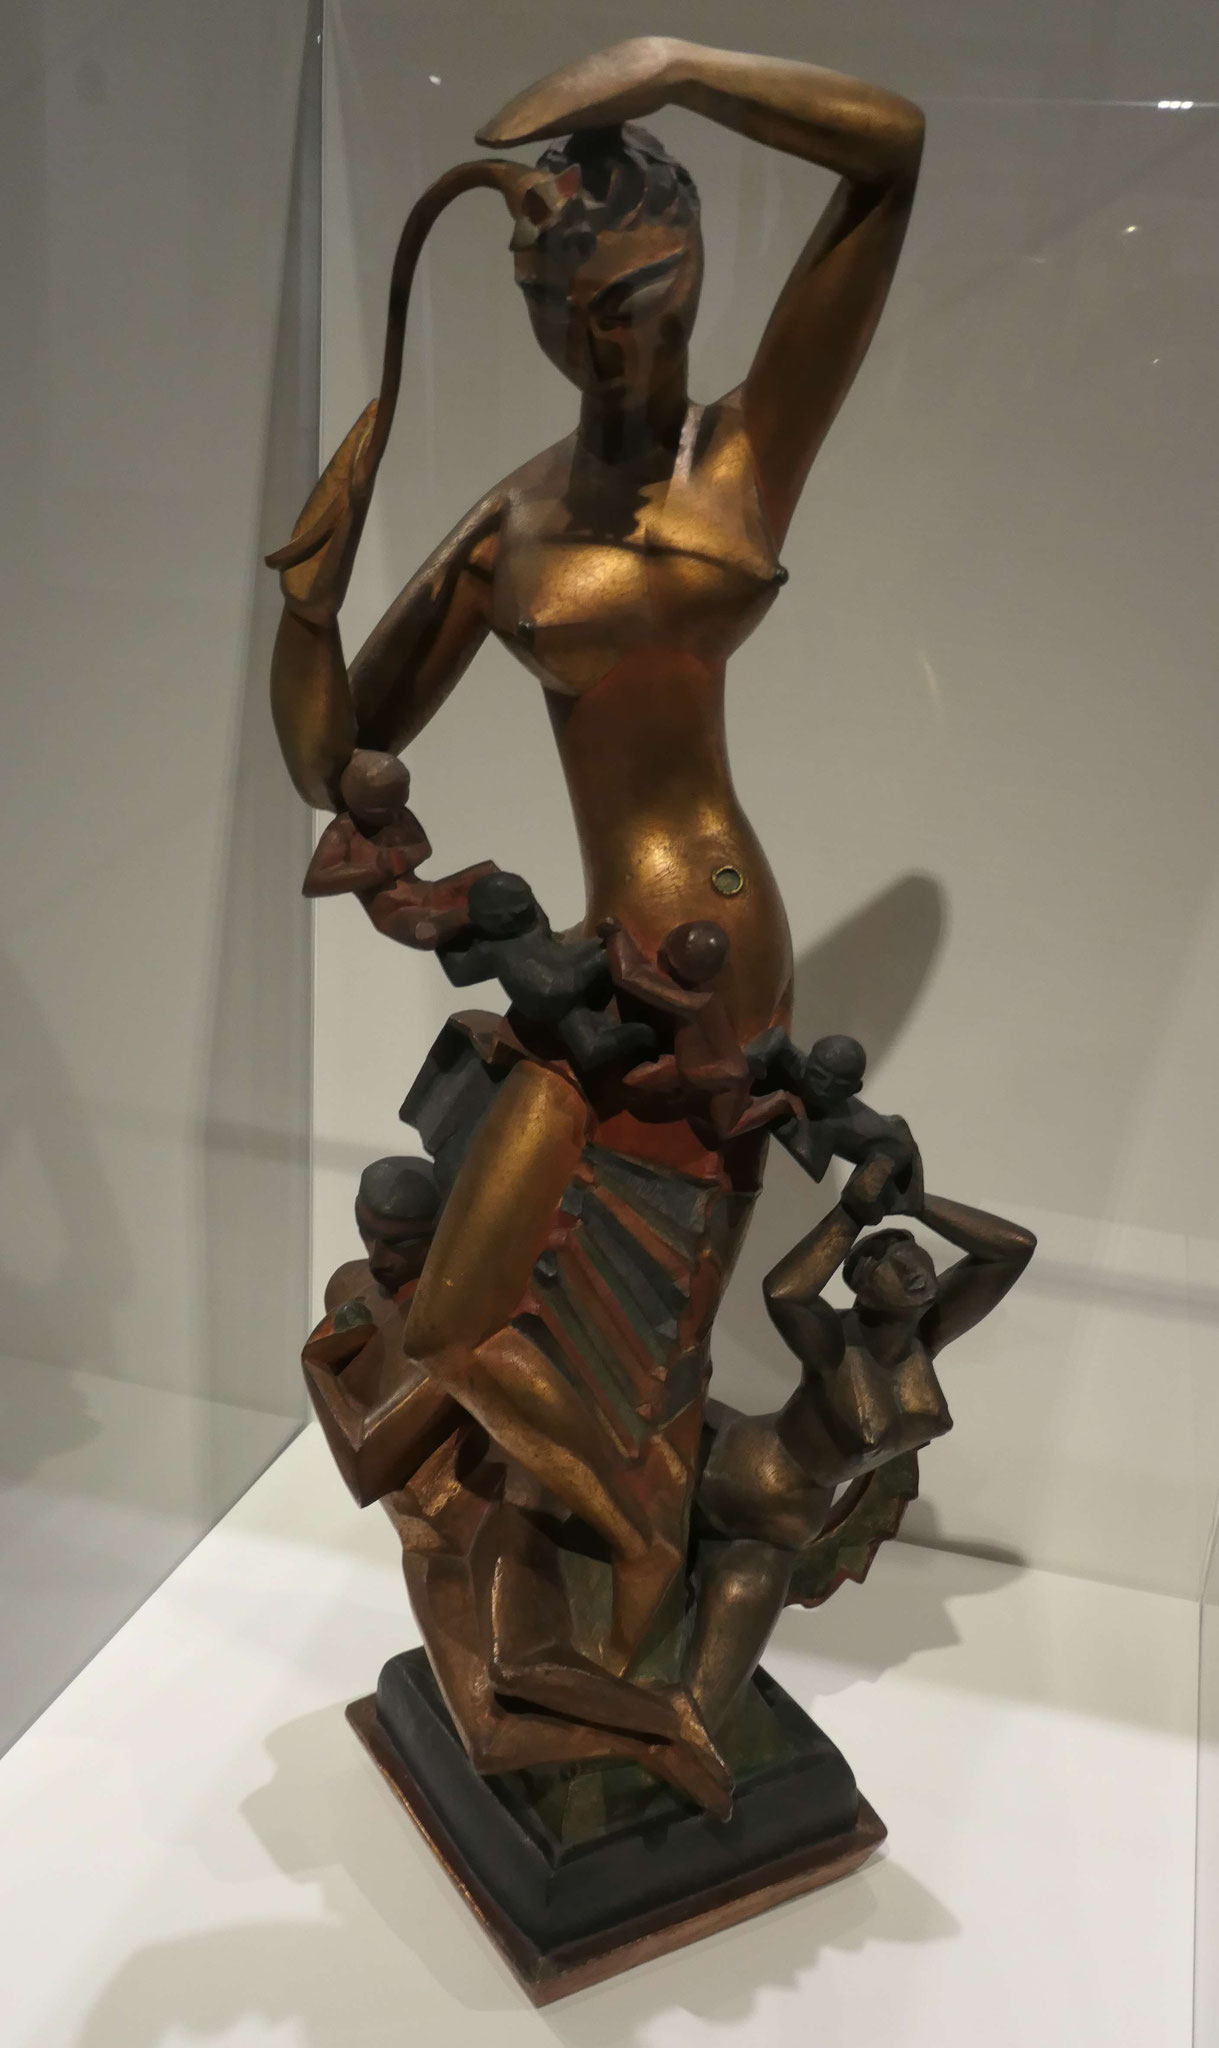 Rudolf Belling, Gruppe Natur, 1918, Neue Nationalgalerie Berlin